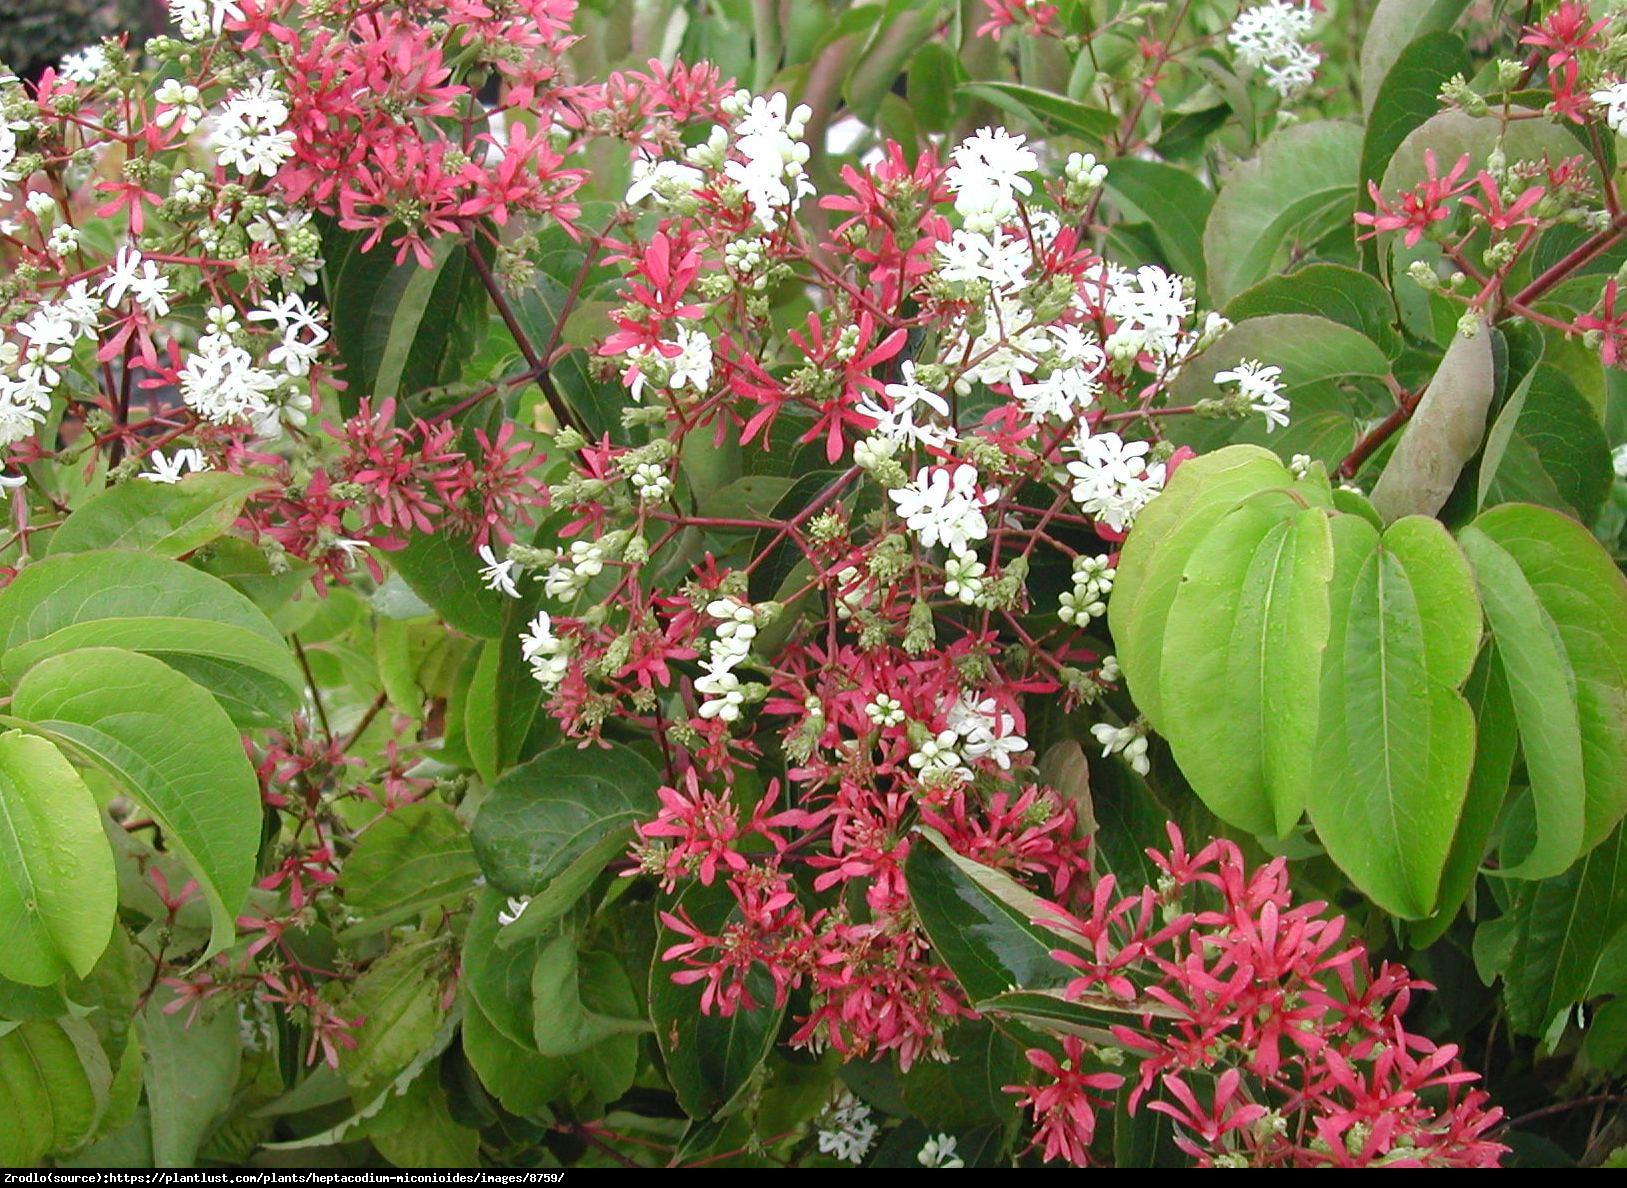 Heptakodium chińskie - Heptacodium miconioides